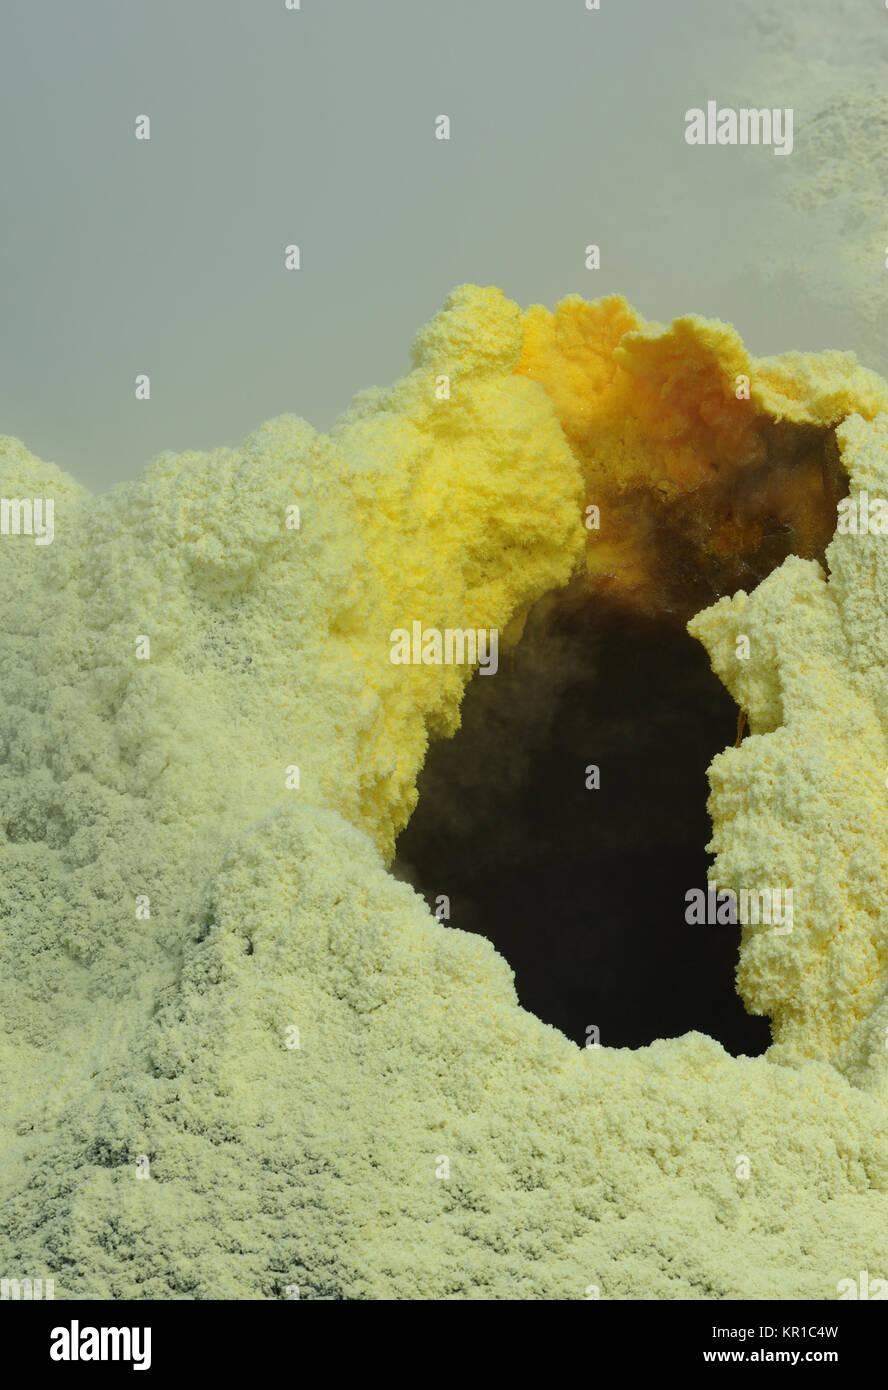 Active fumaroles and deposits of sulphur within the caldera of the Sierra Negra Volcano. Isabela, Galapagos, Ecuador - Stock Image